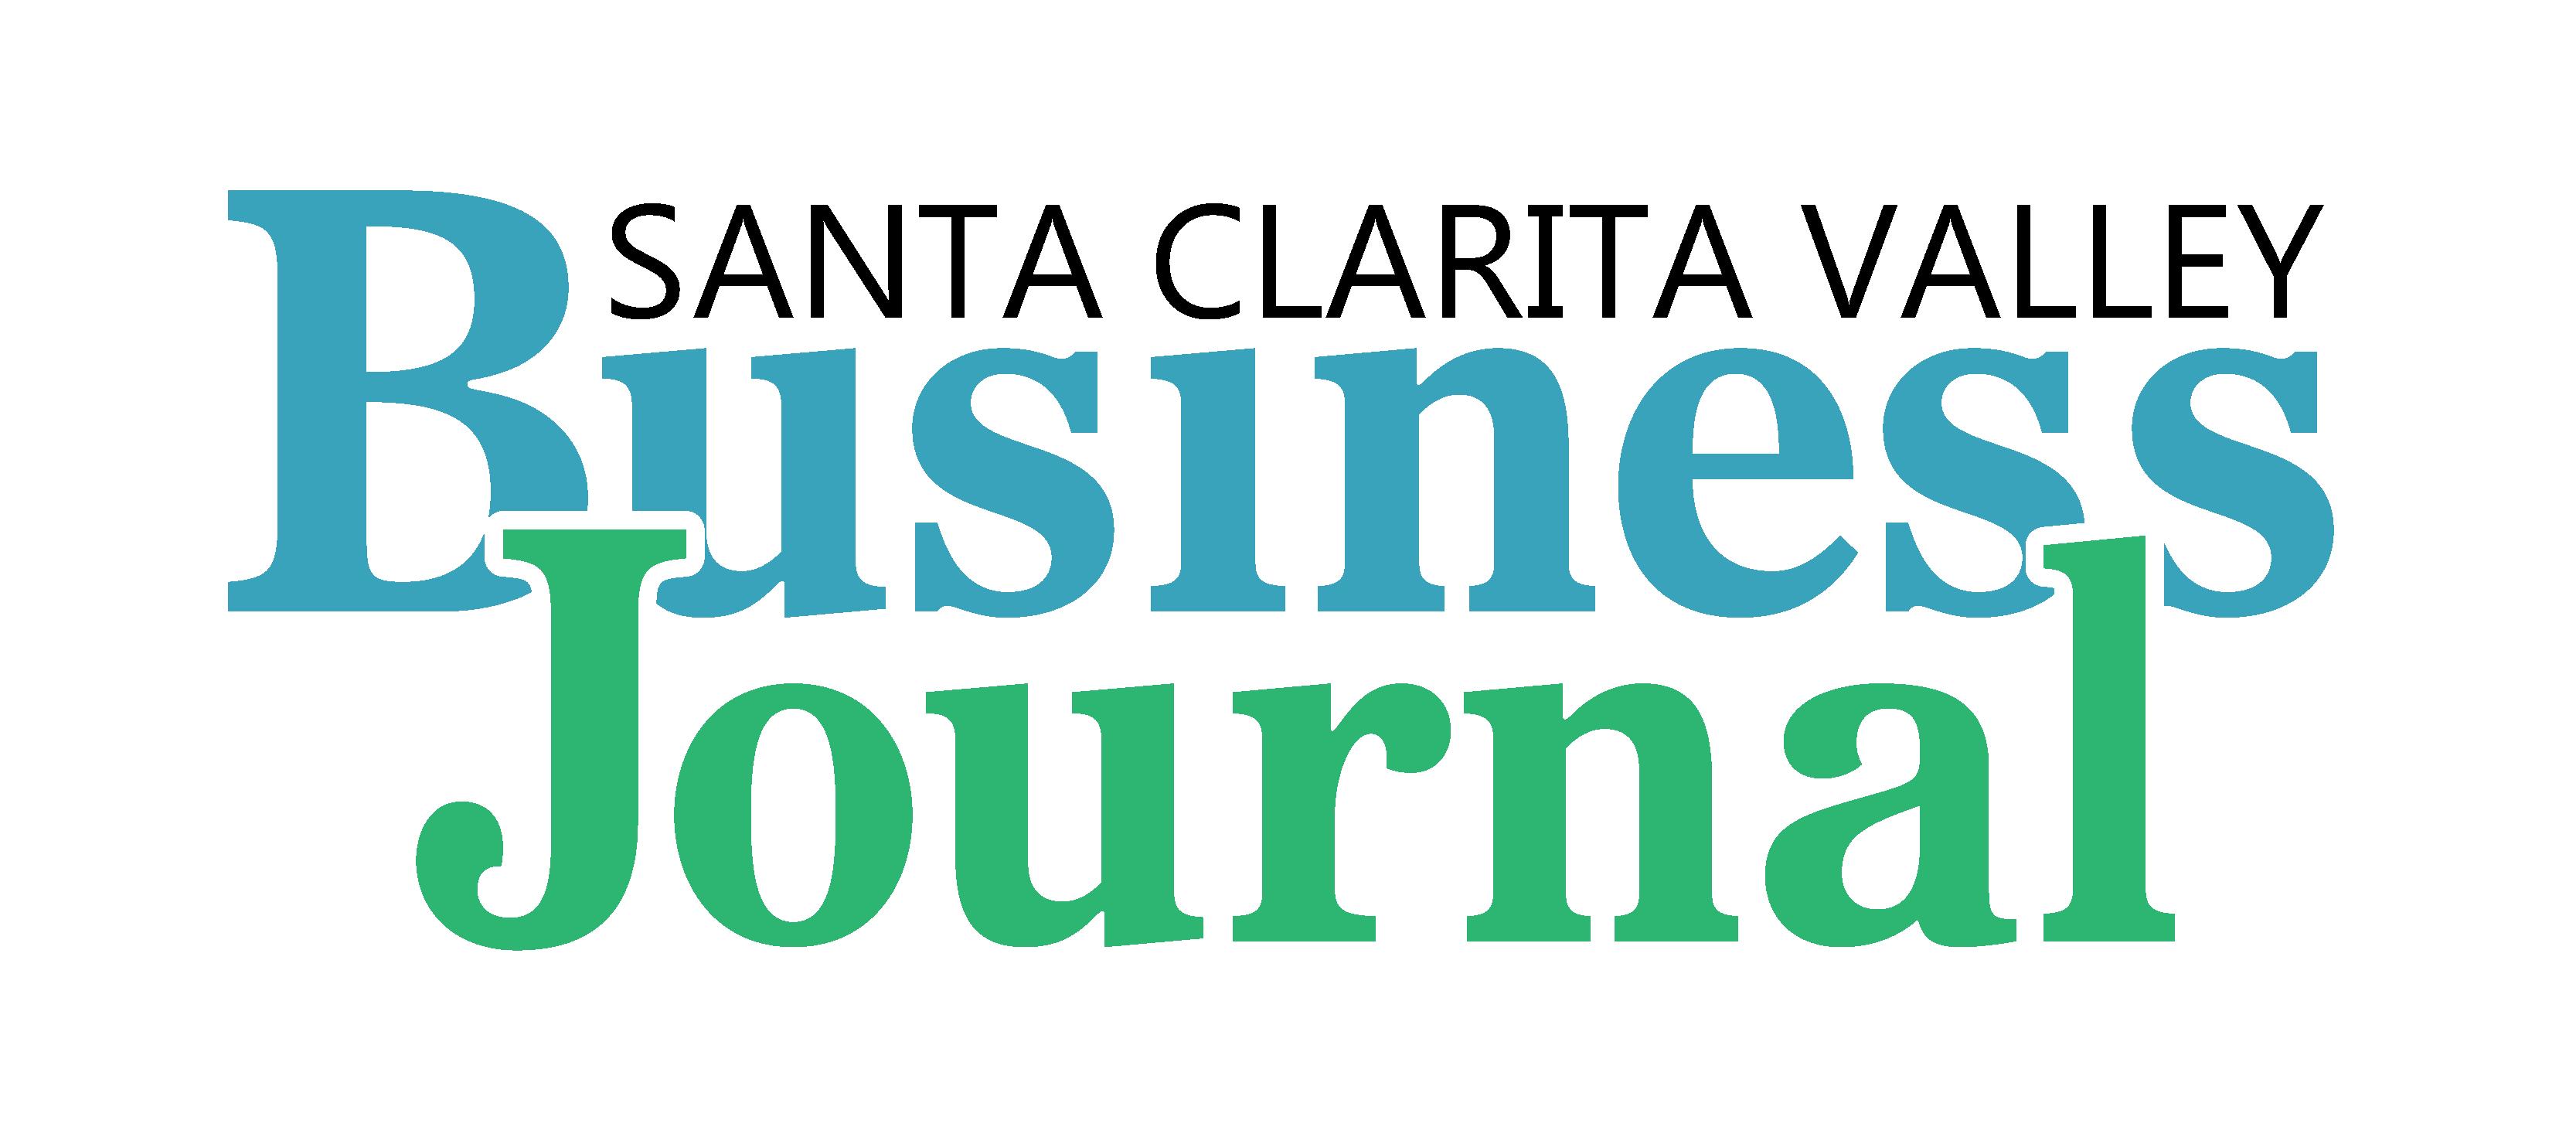 Santa Clarita Valley Business Journal